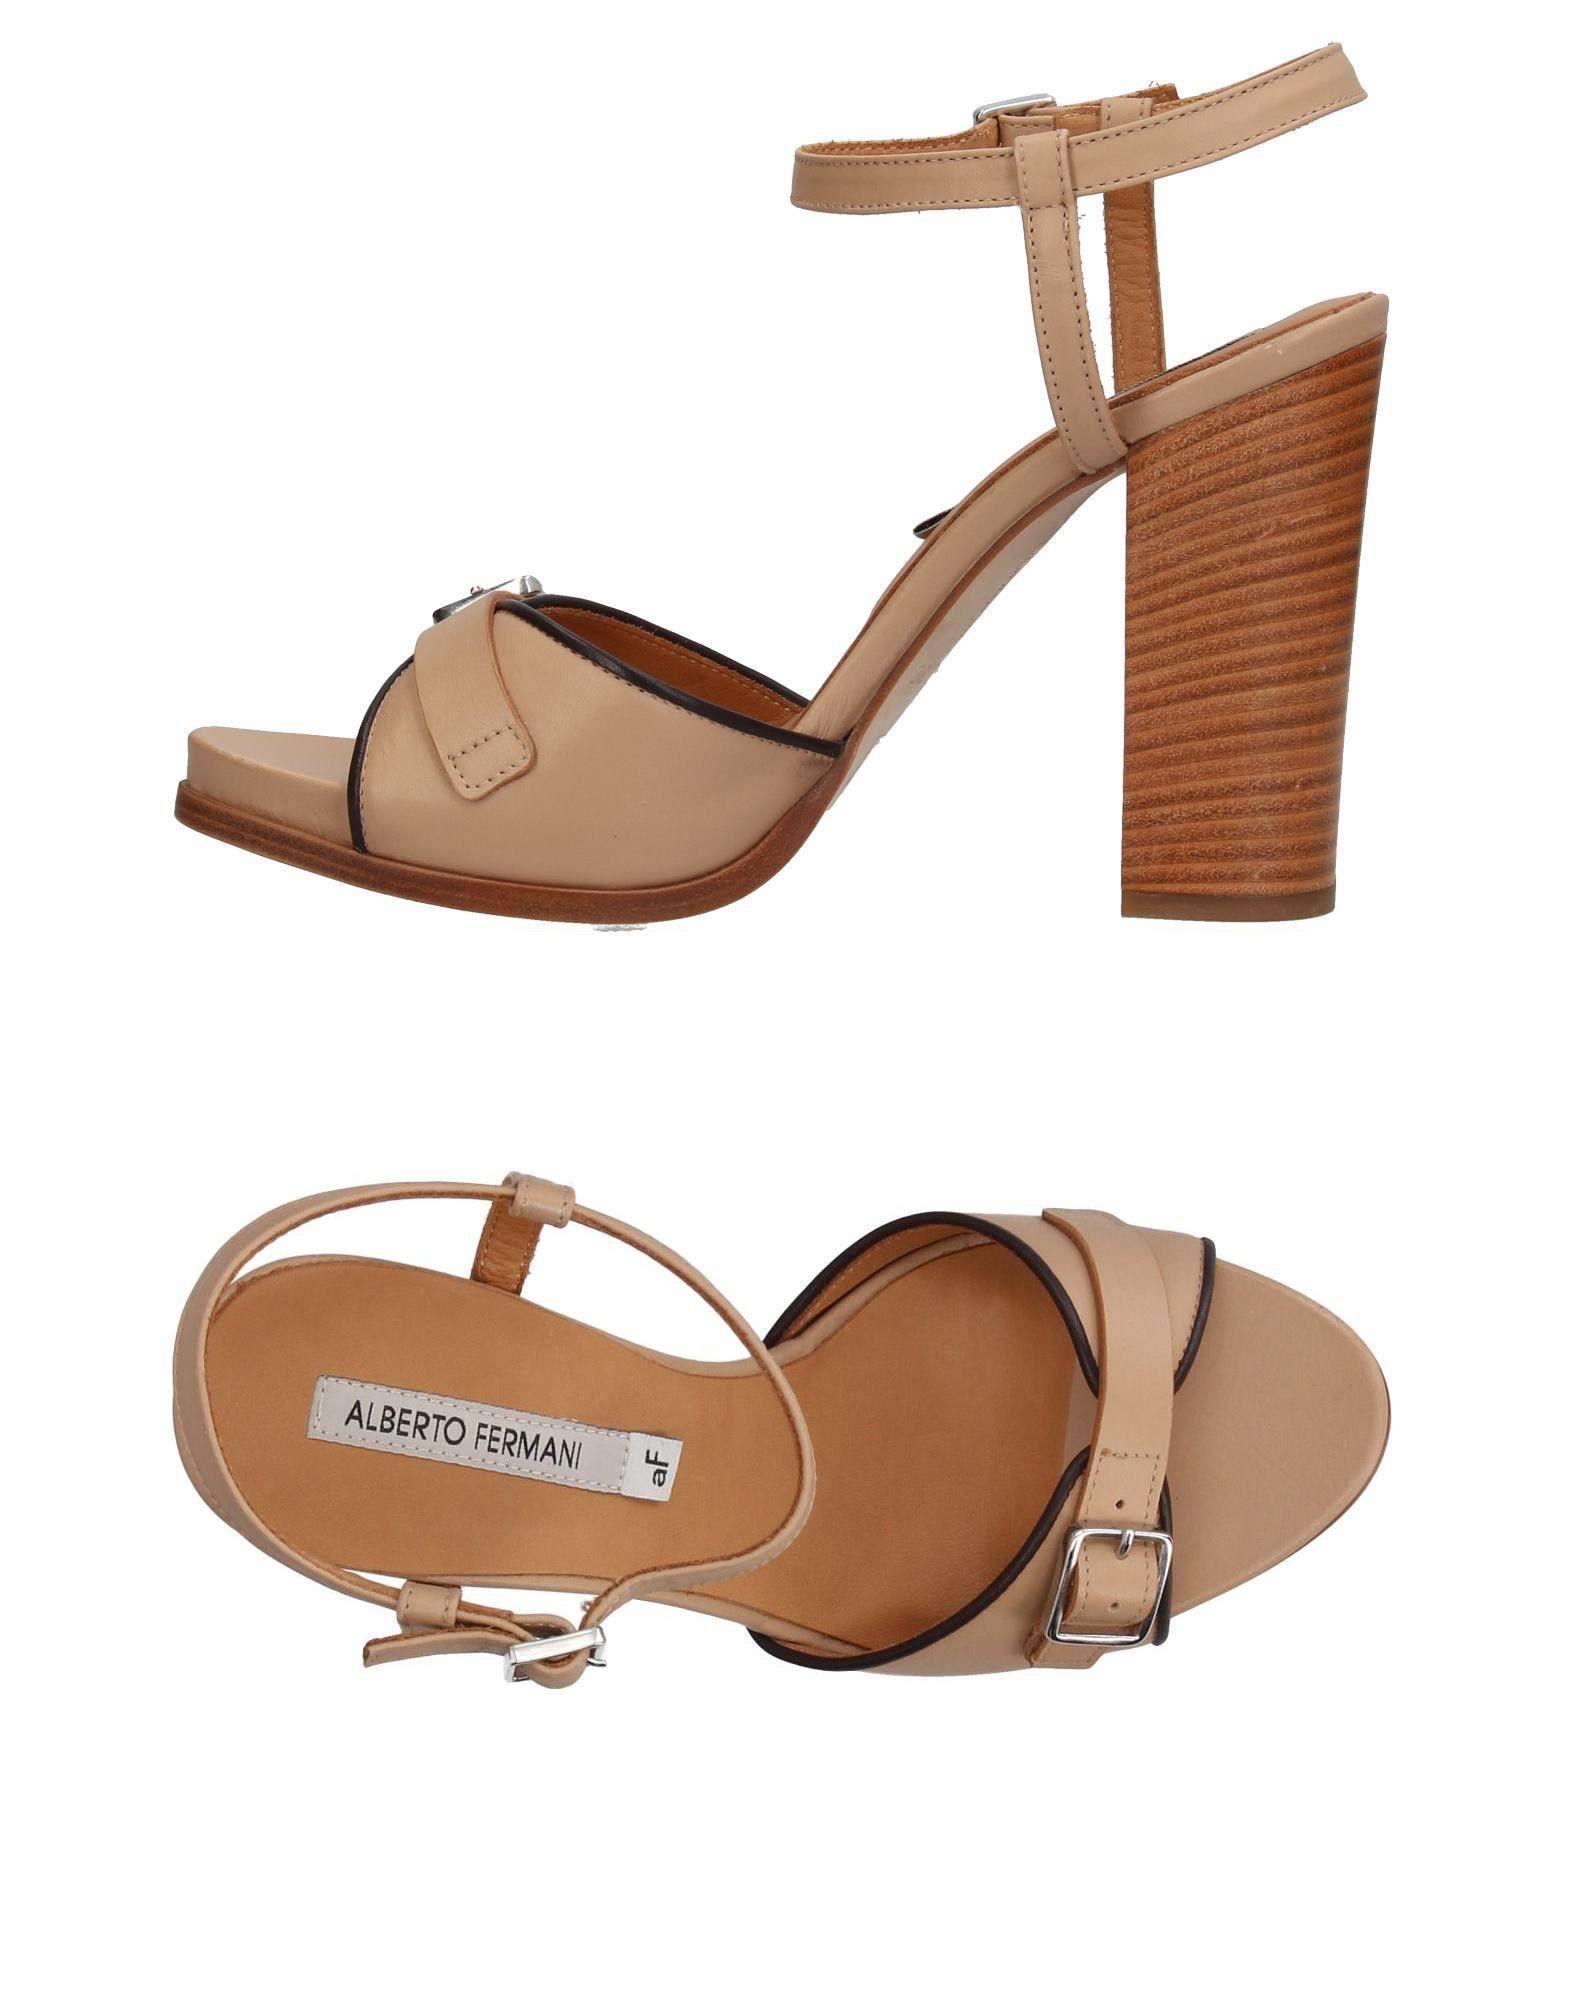 Alberto Fermani Sandalen Damen Gute  11366477JB Gute Damen Qualität beliebte Schuhe aedeec